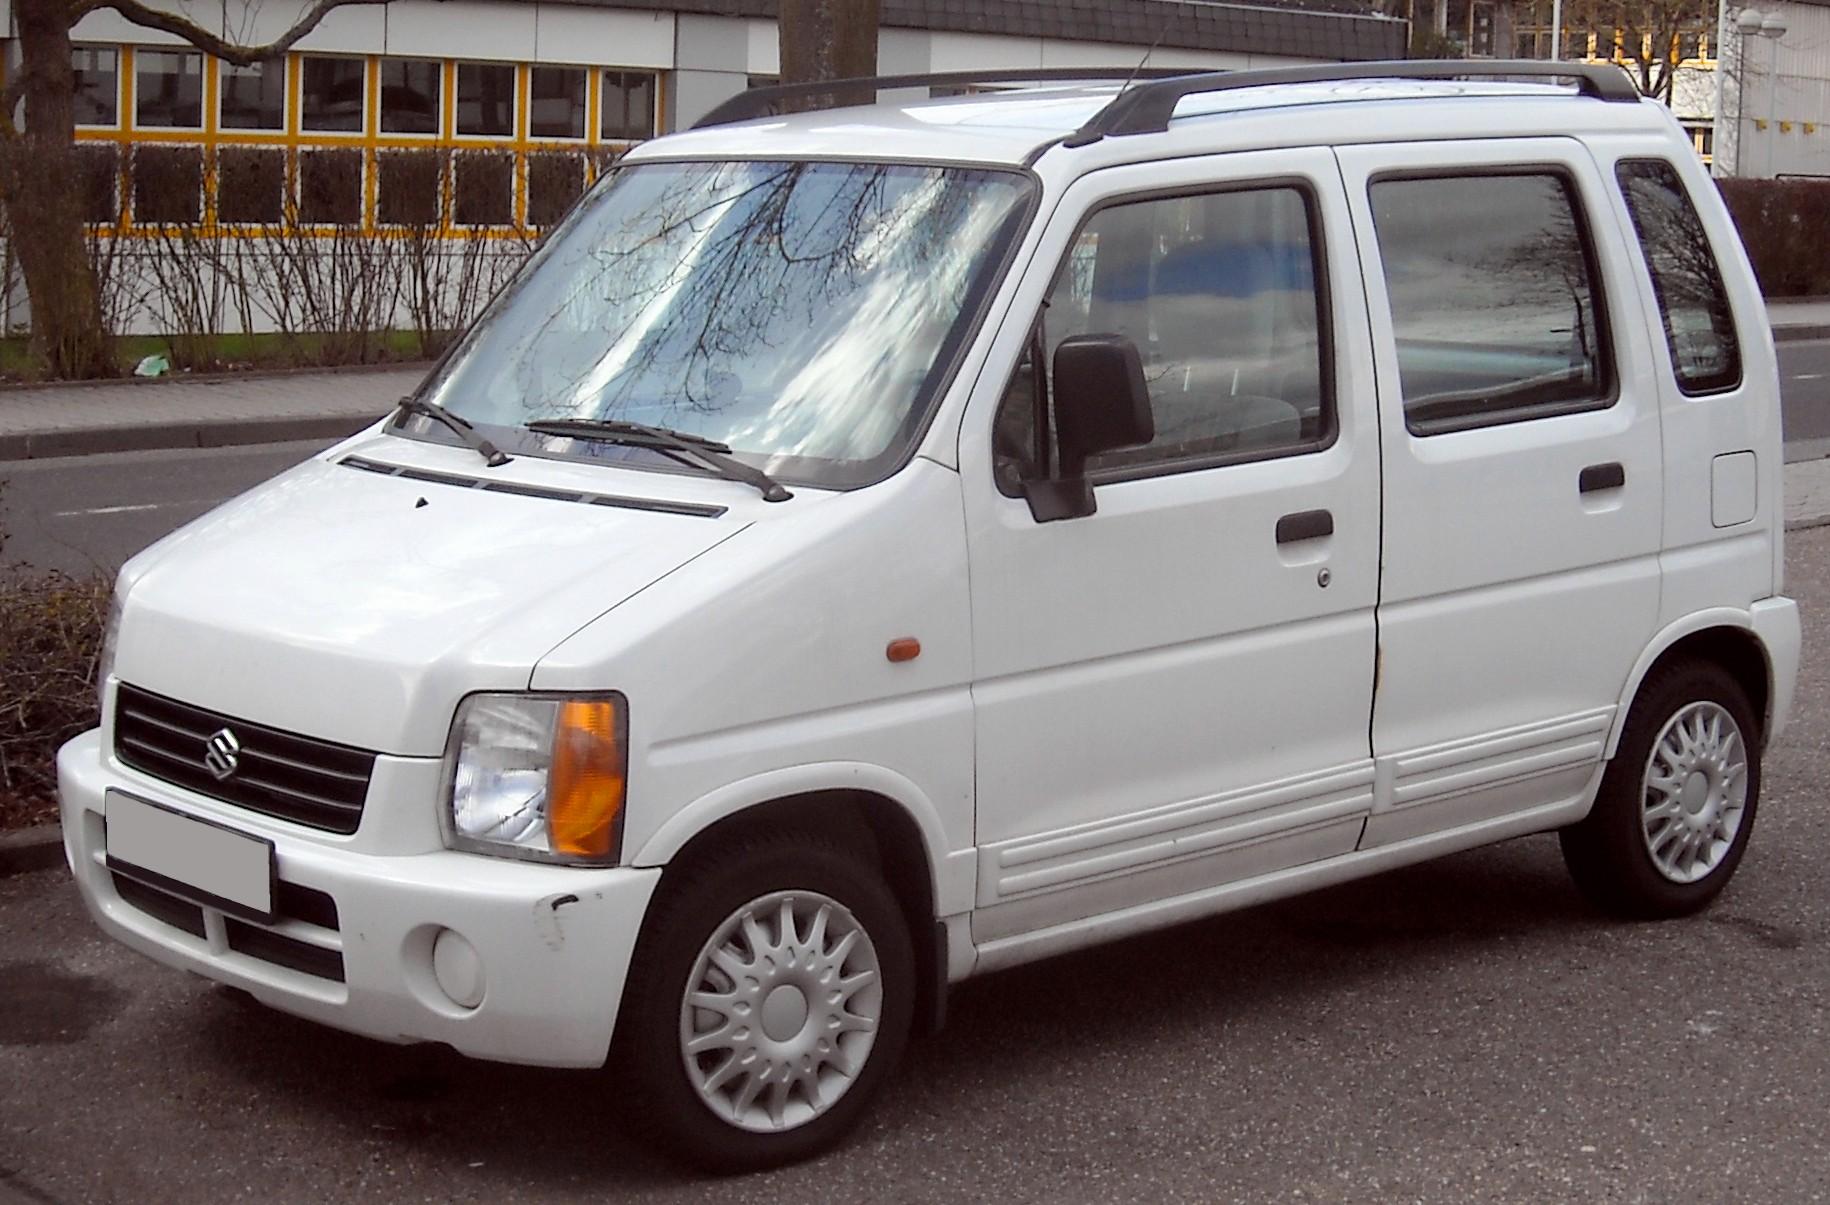 hight resolution of file suzuki wagon r front 20100402 jpg